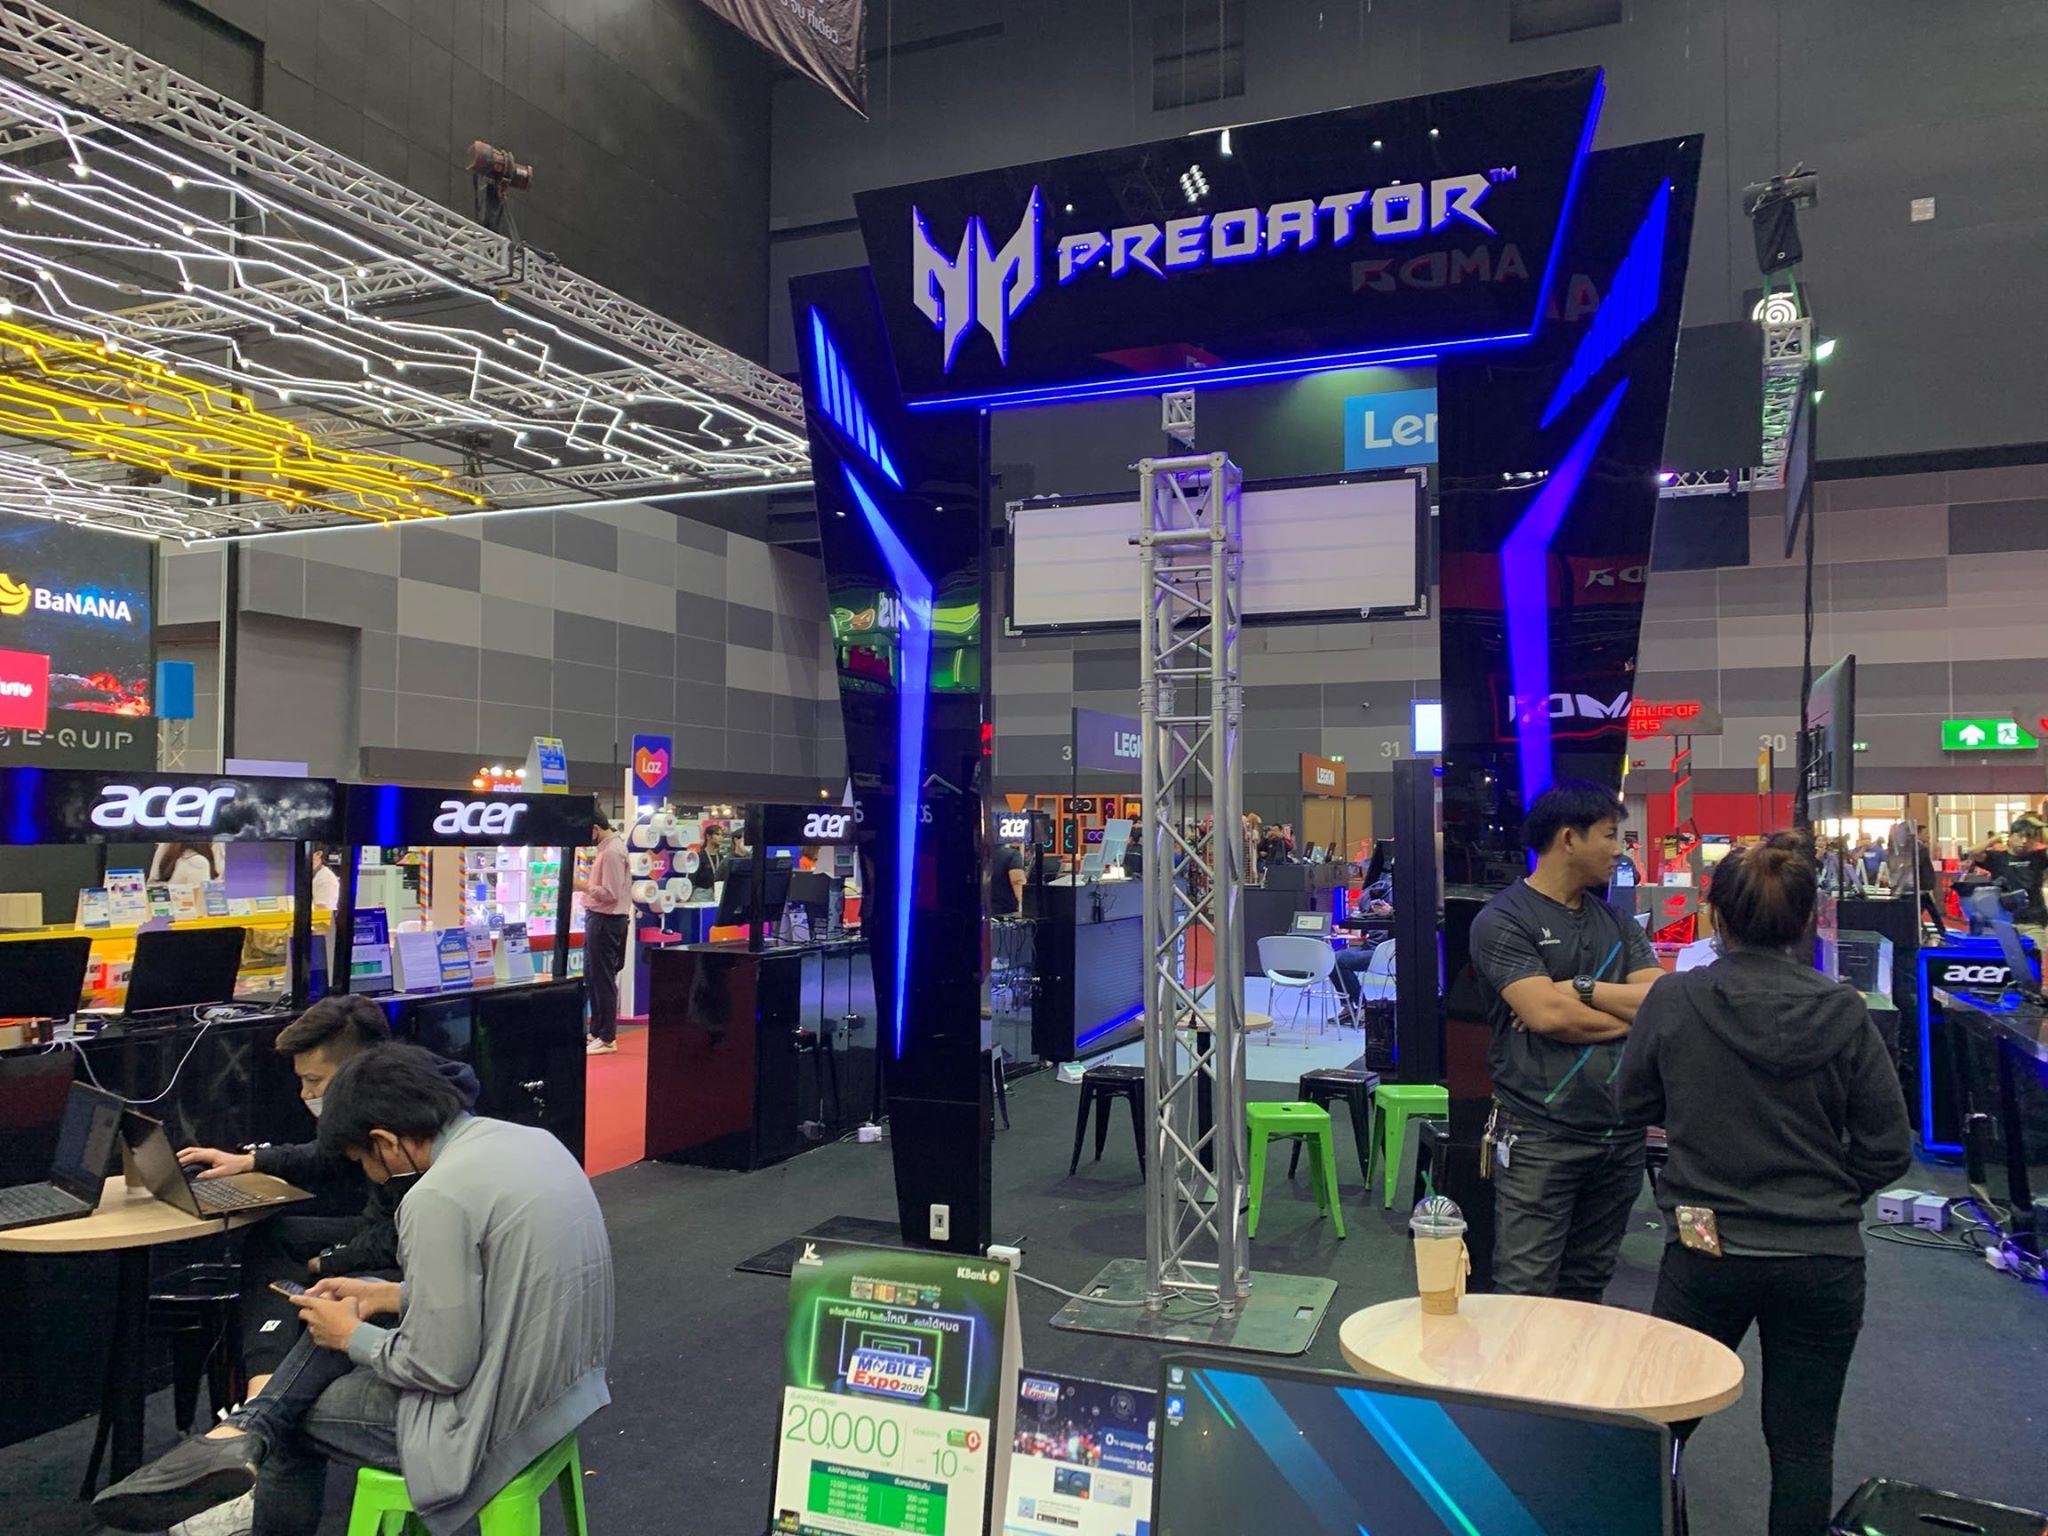 Thailand Game Expo 3112020 3